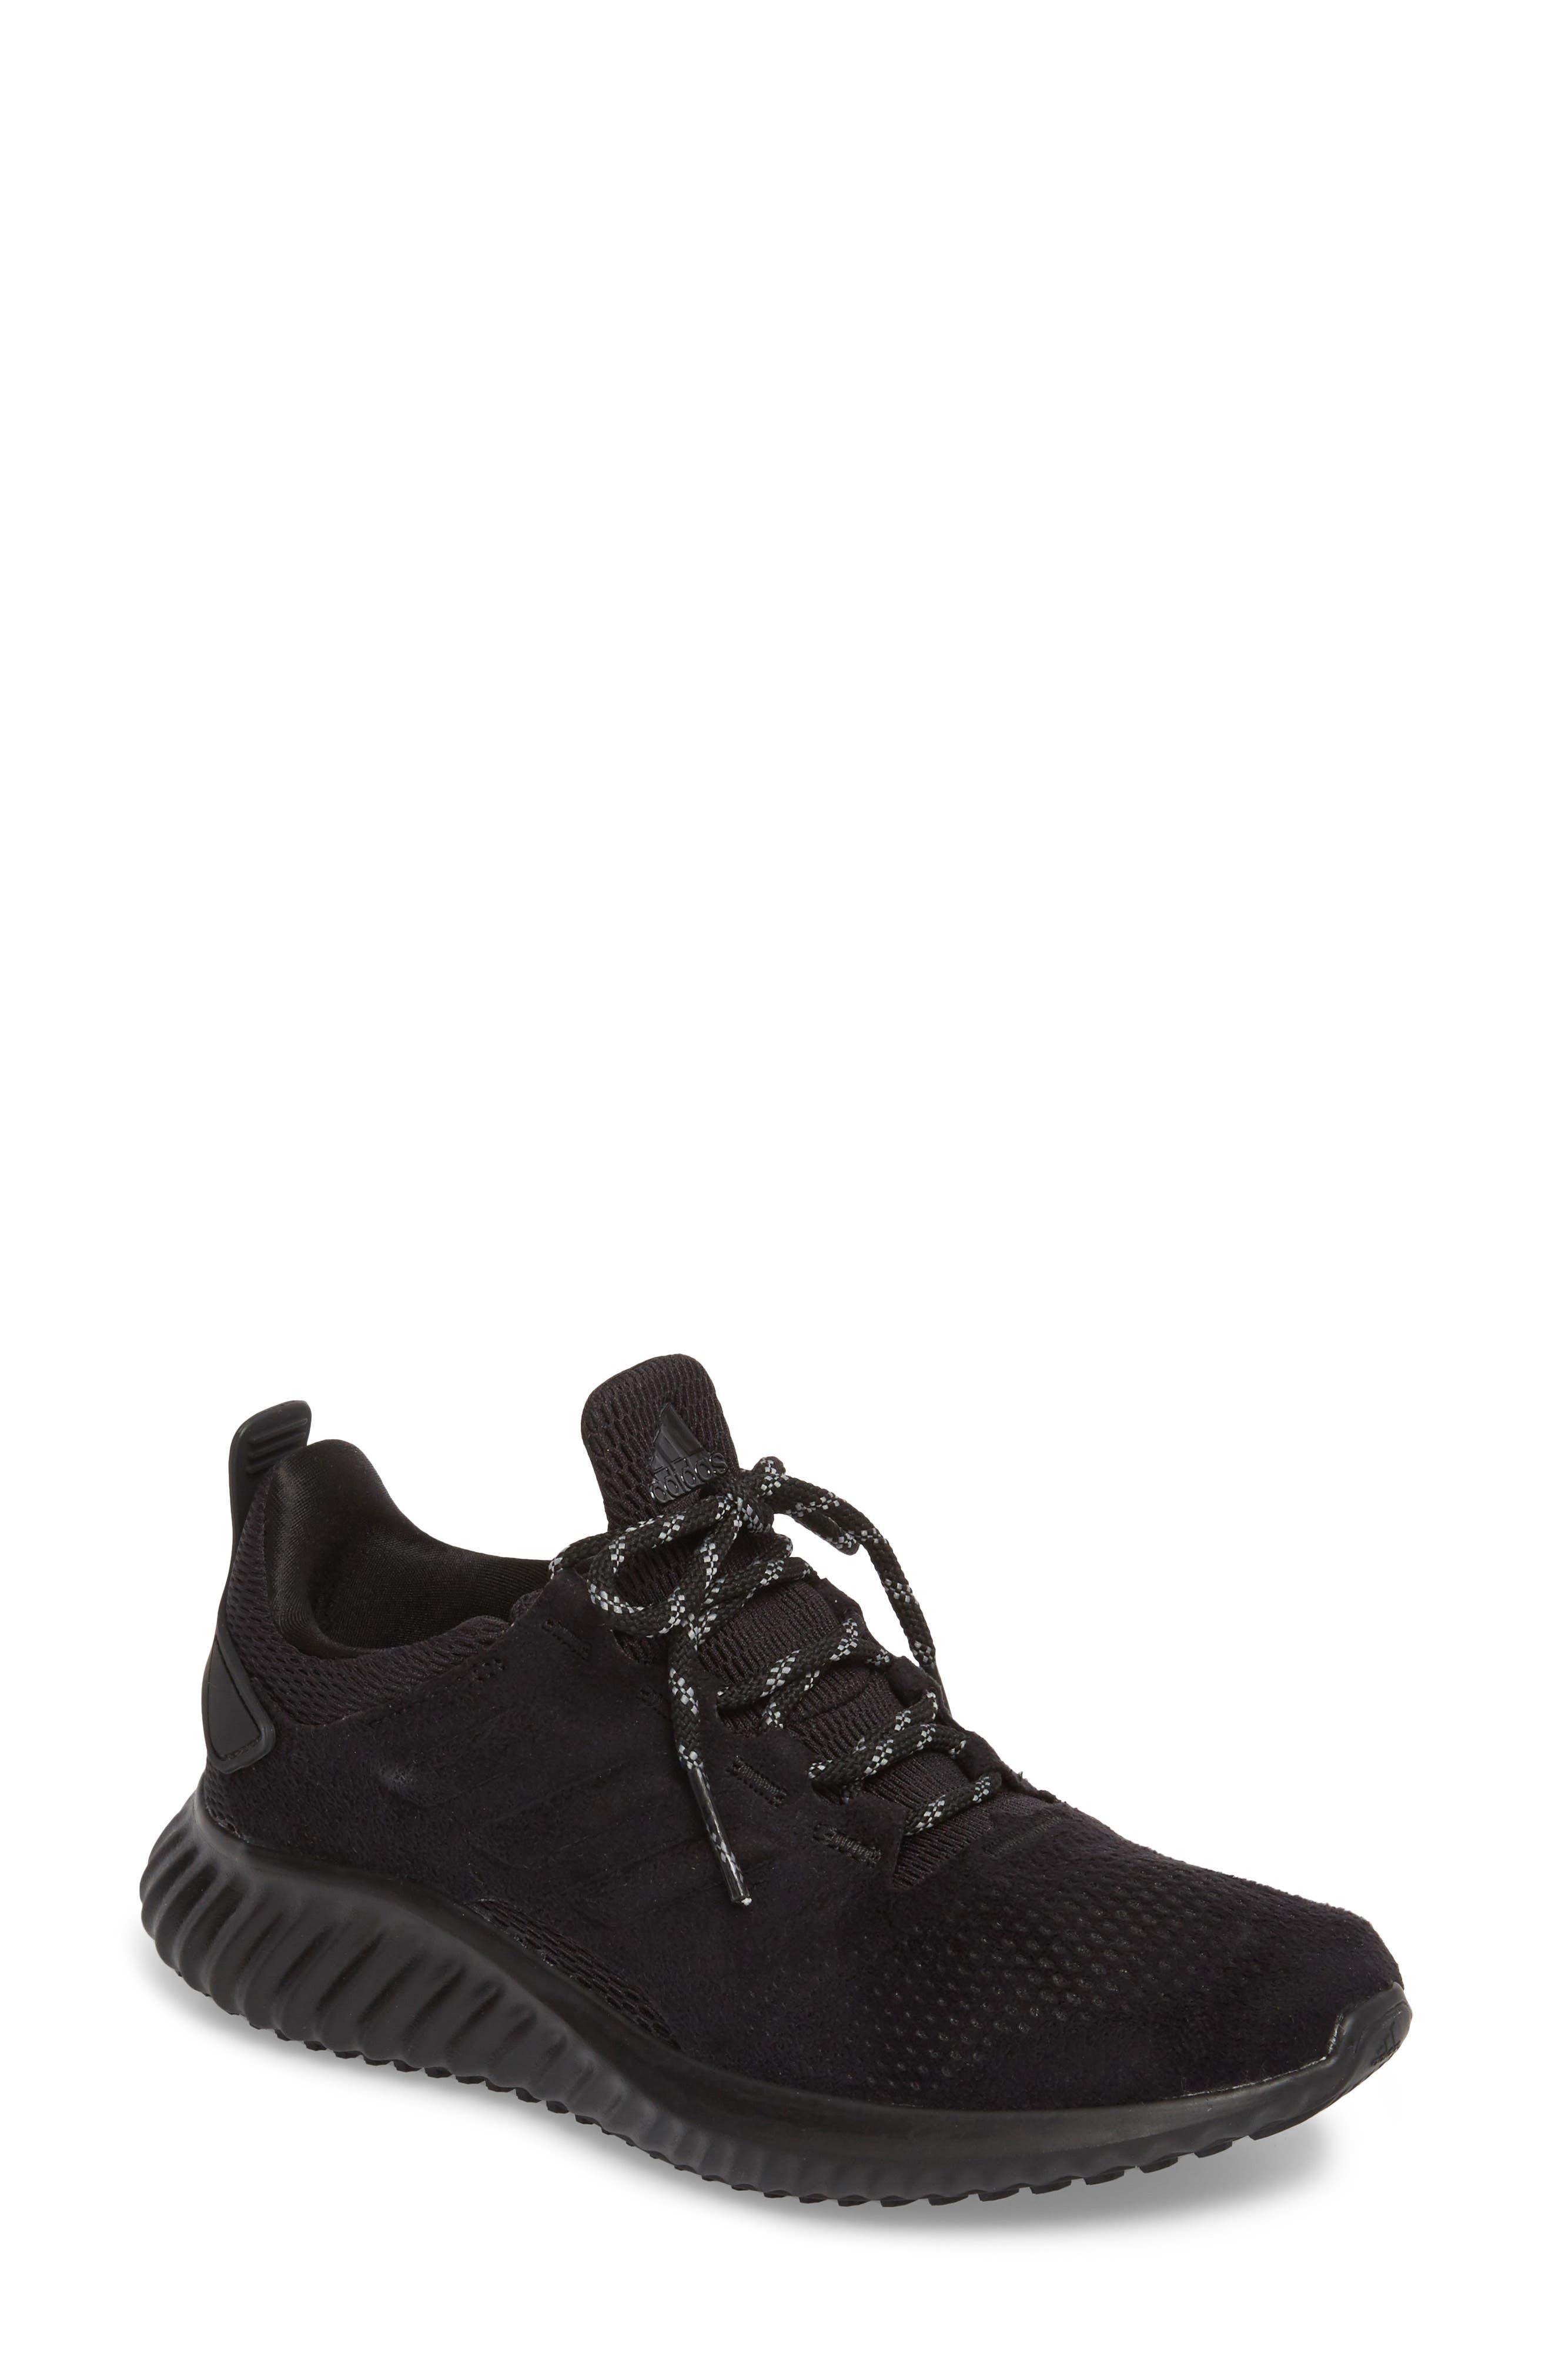 AlphaBounce CR Running Shoe,                         Main,                         color, CORE BLACK/ CORE BLACK